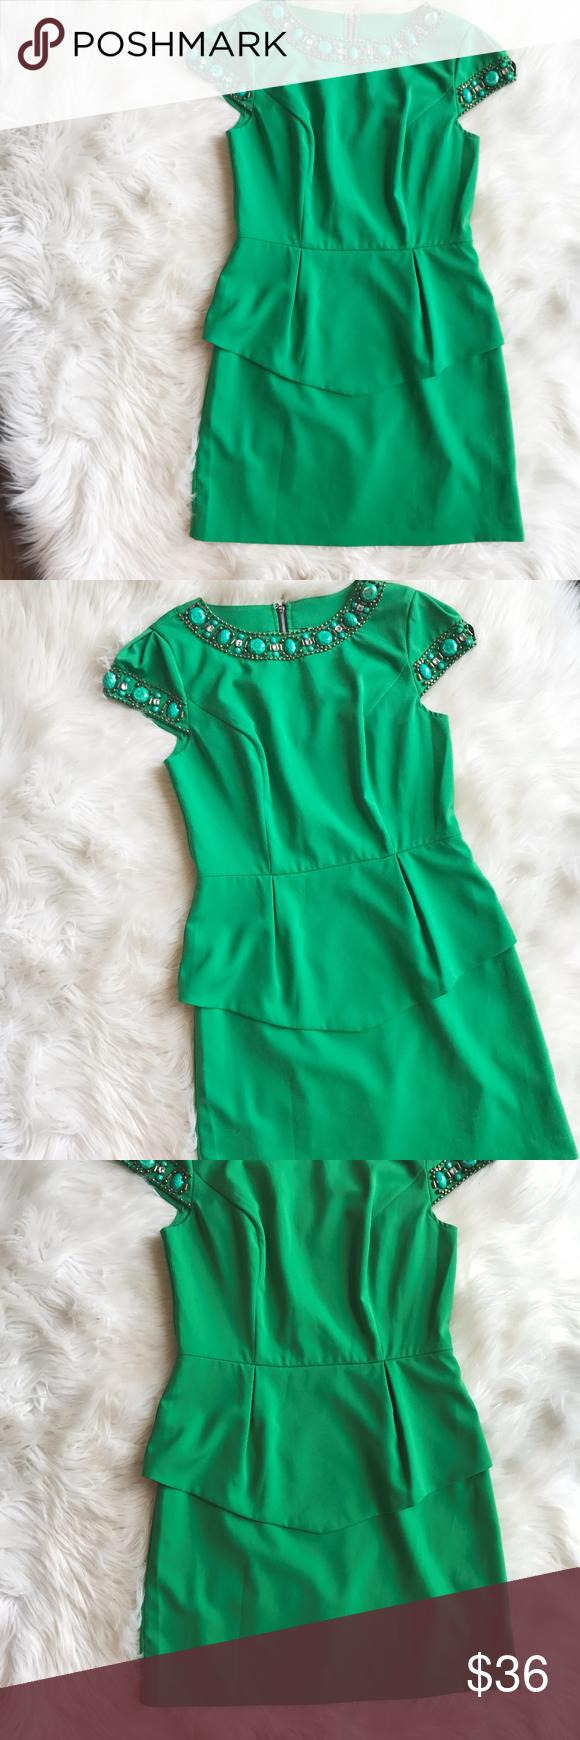 Green dress one shoulder  Kensie Beaded Career Peplum Dress Excellent condition peplum style